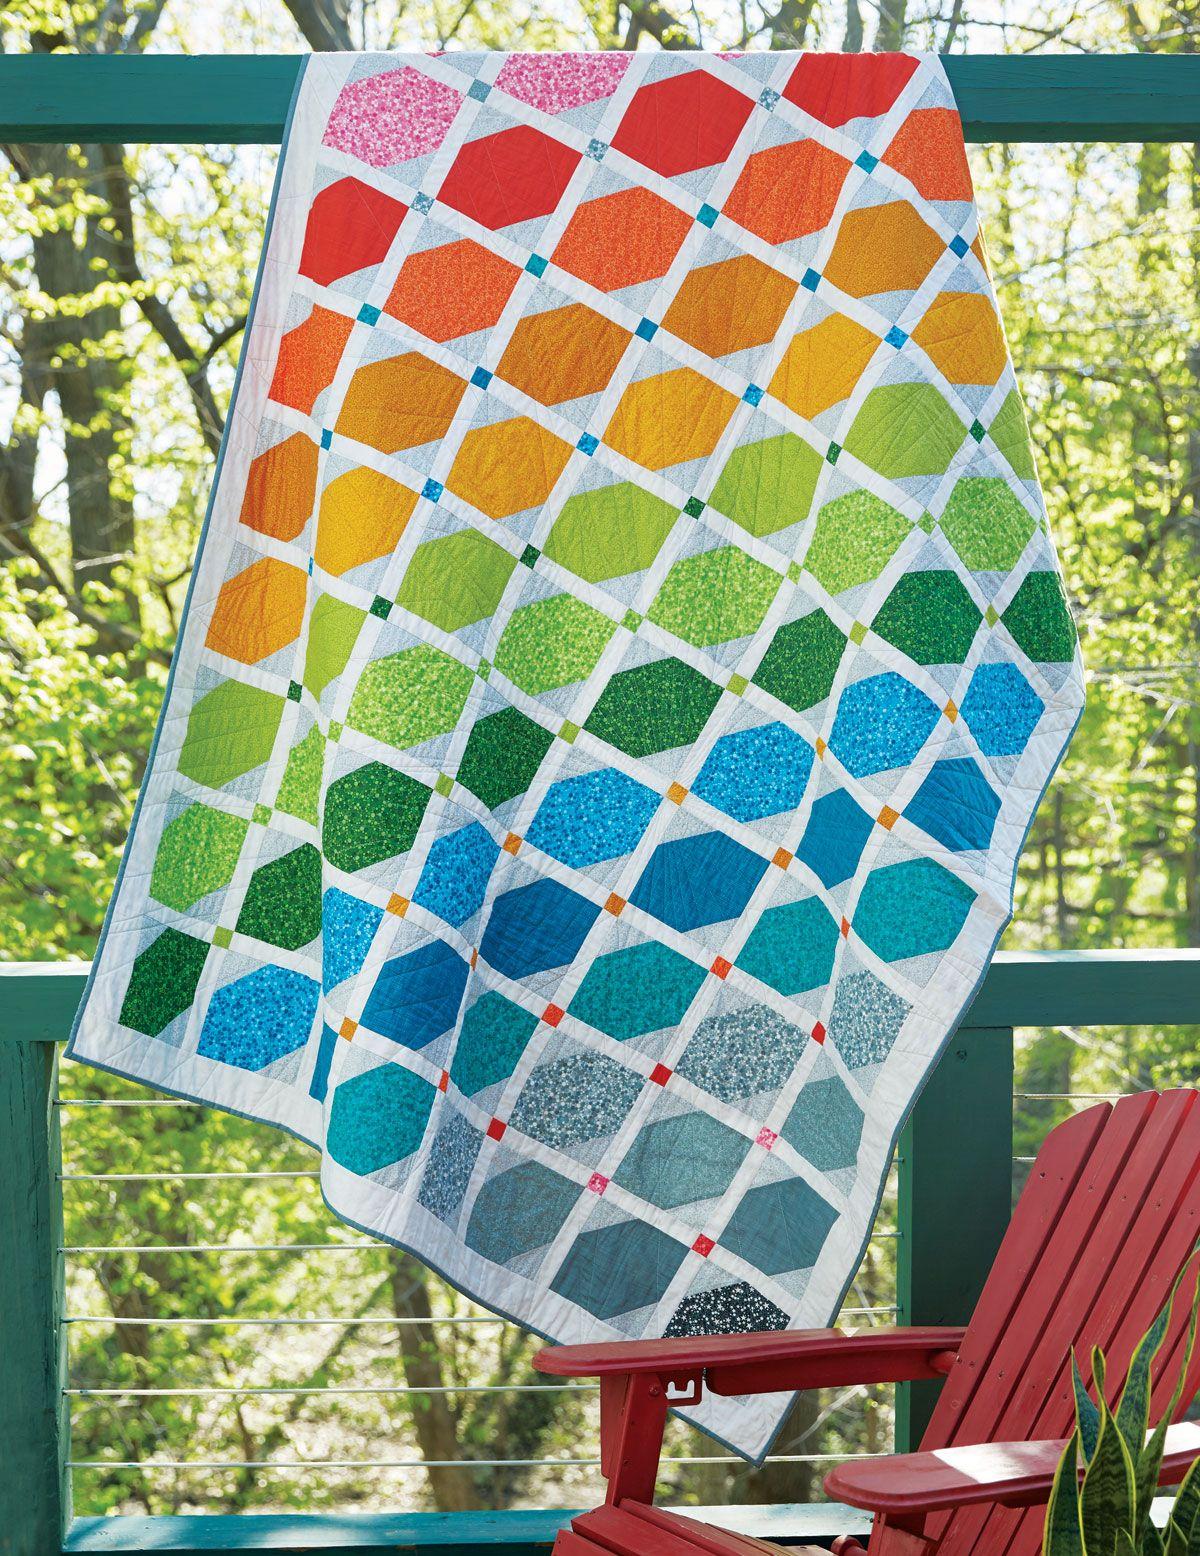 Rainbow Quilt - Fons & Porter | Rainbow quilt, Contemporary quilts ... : rainbow quilt pattern - Adamdwight.com